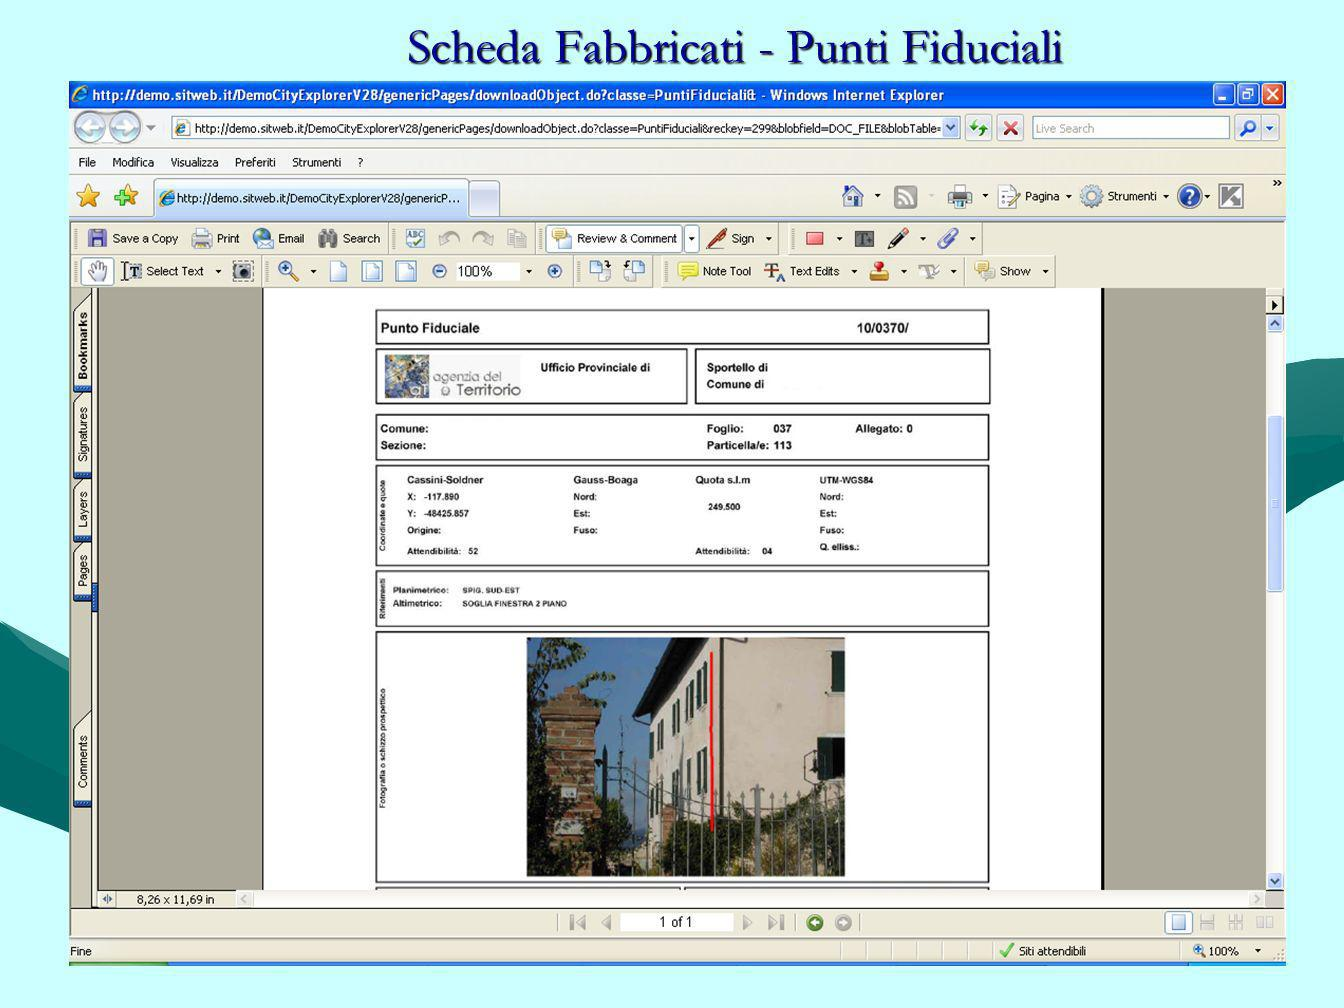 Scheda Fabbricati - Punti Fiduciali